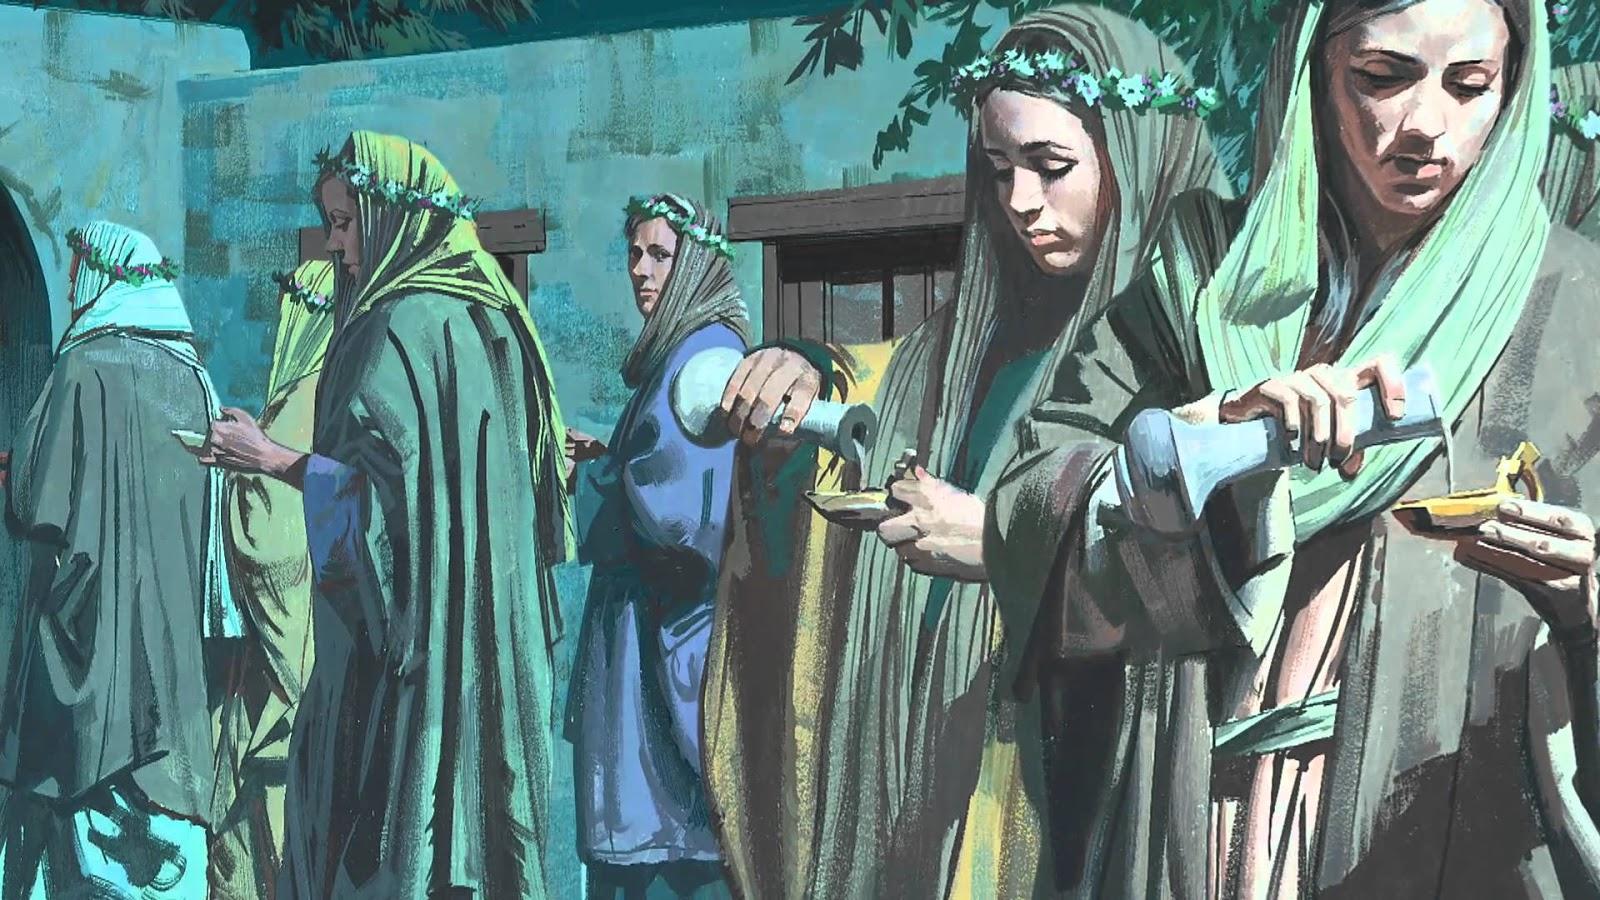 Lds 10 Virgins Parable